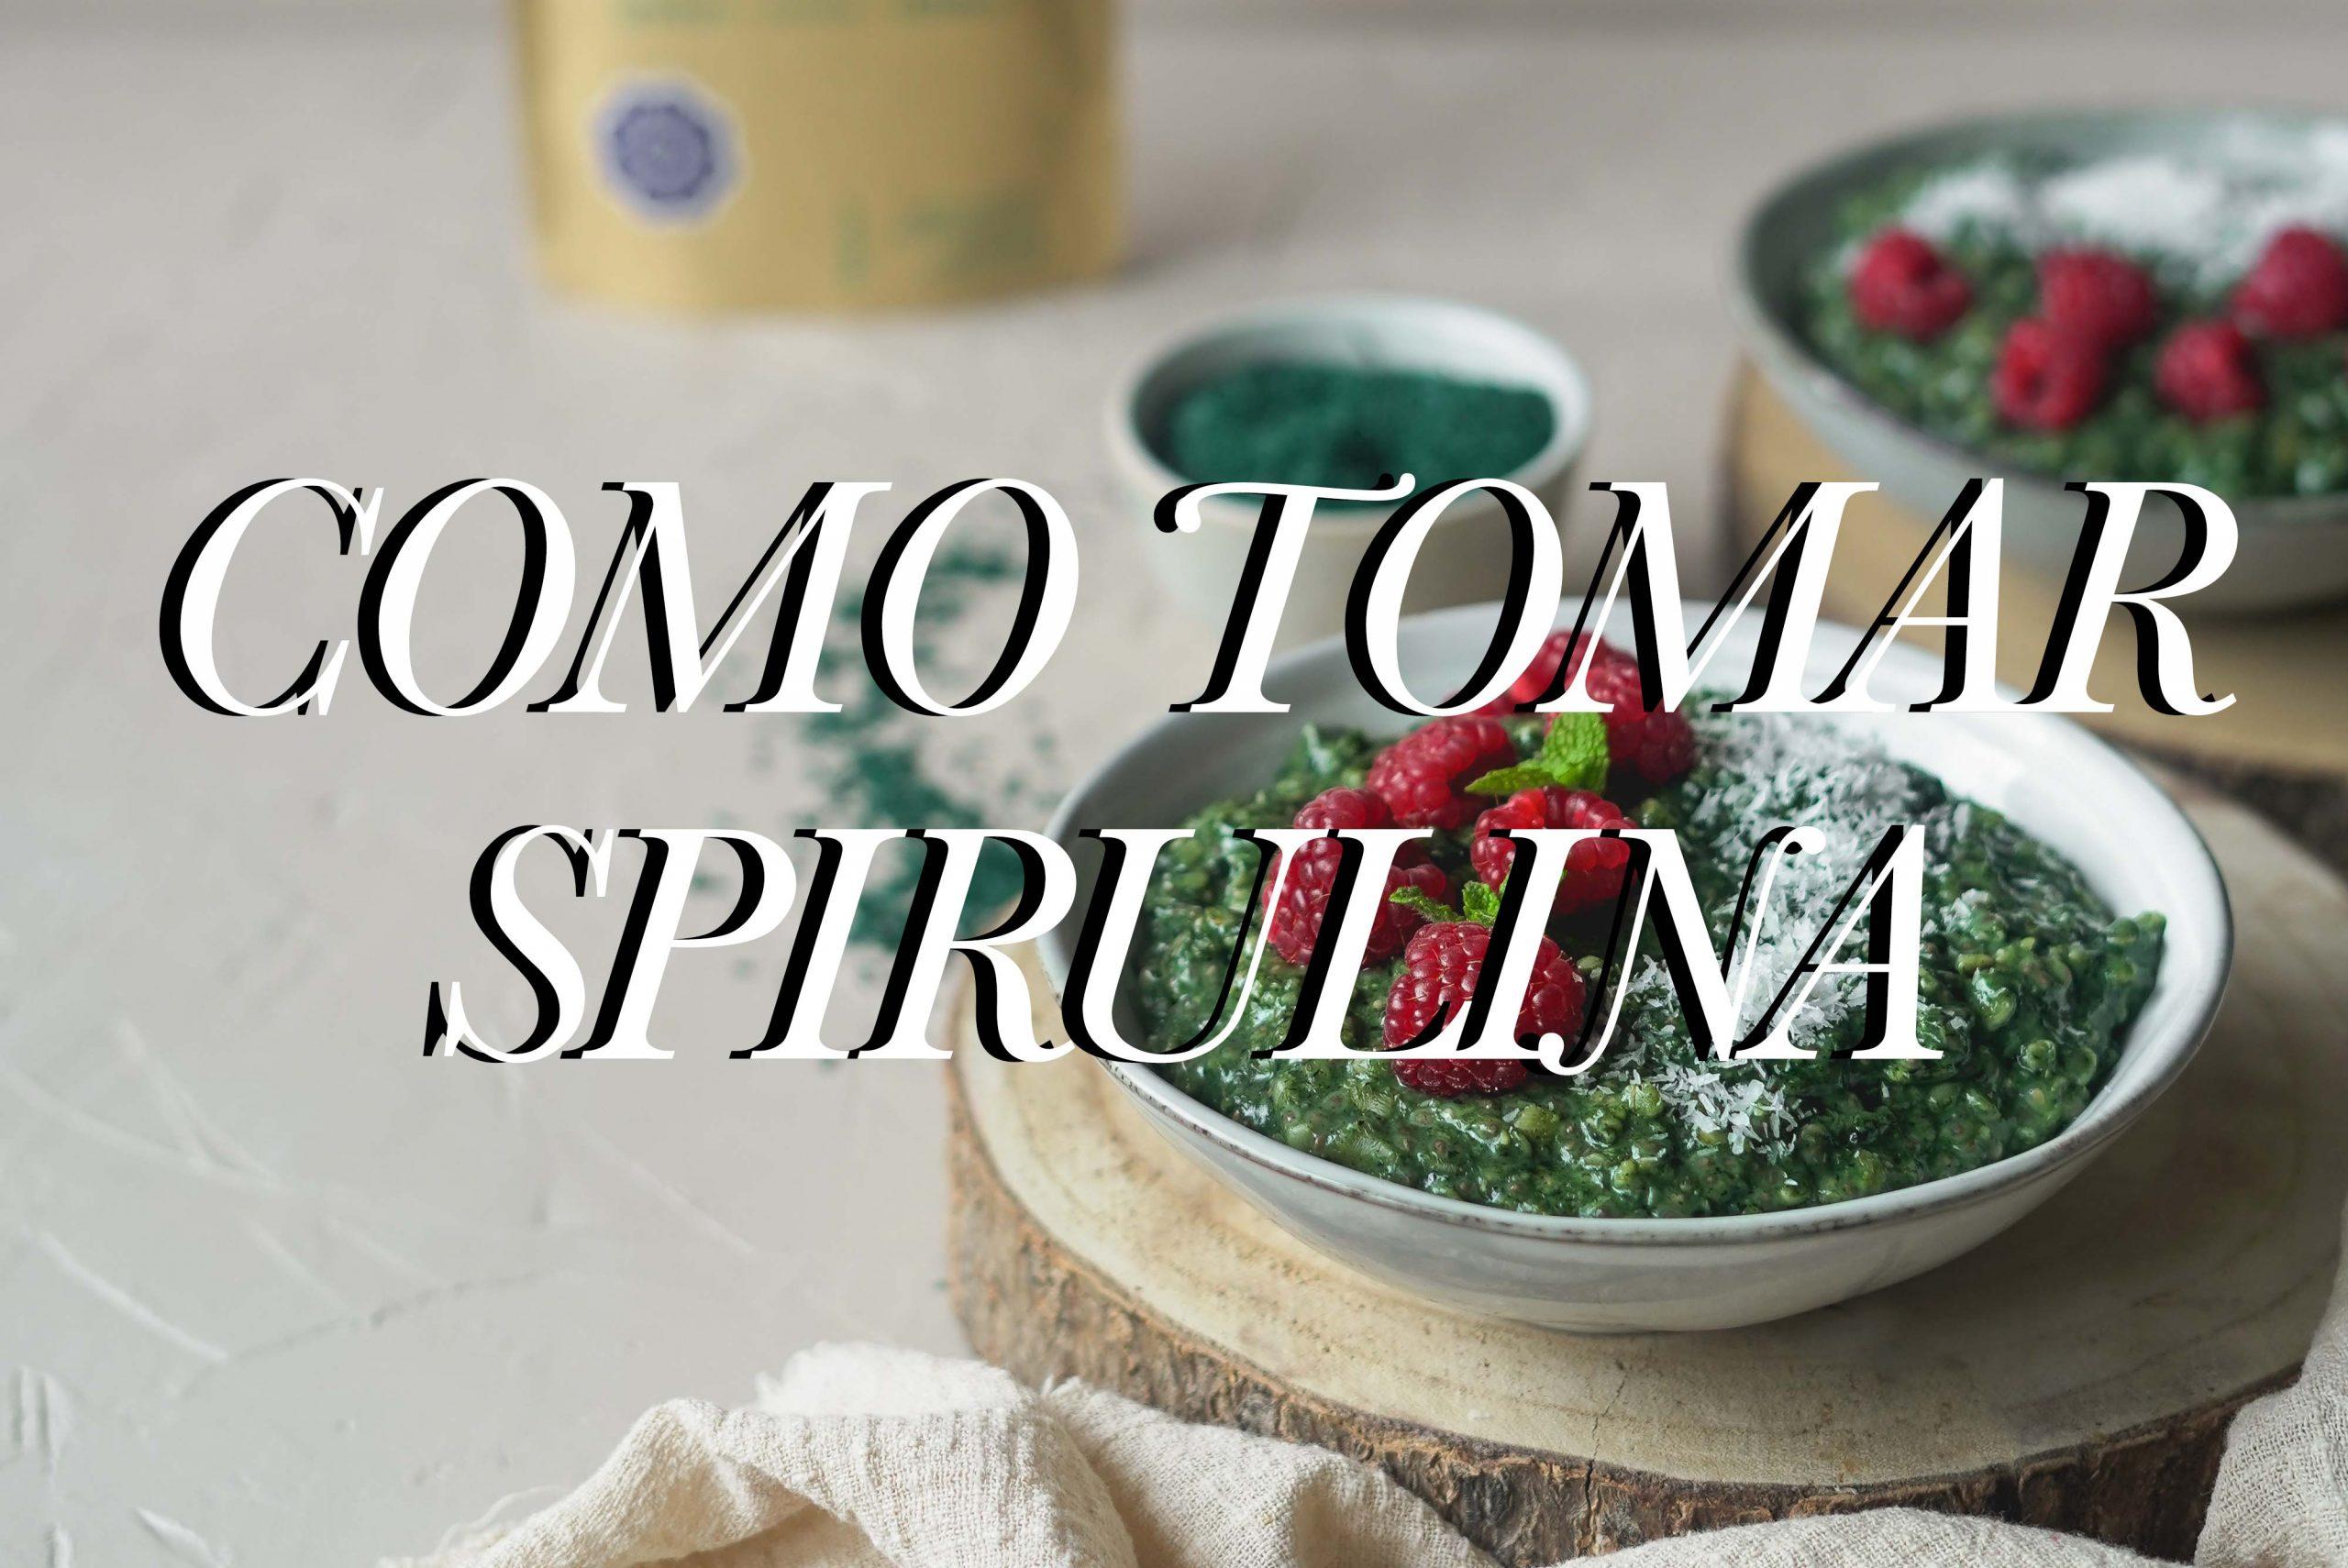 Como tomar Spirulina